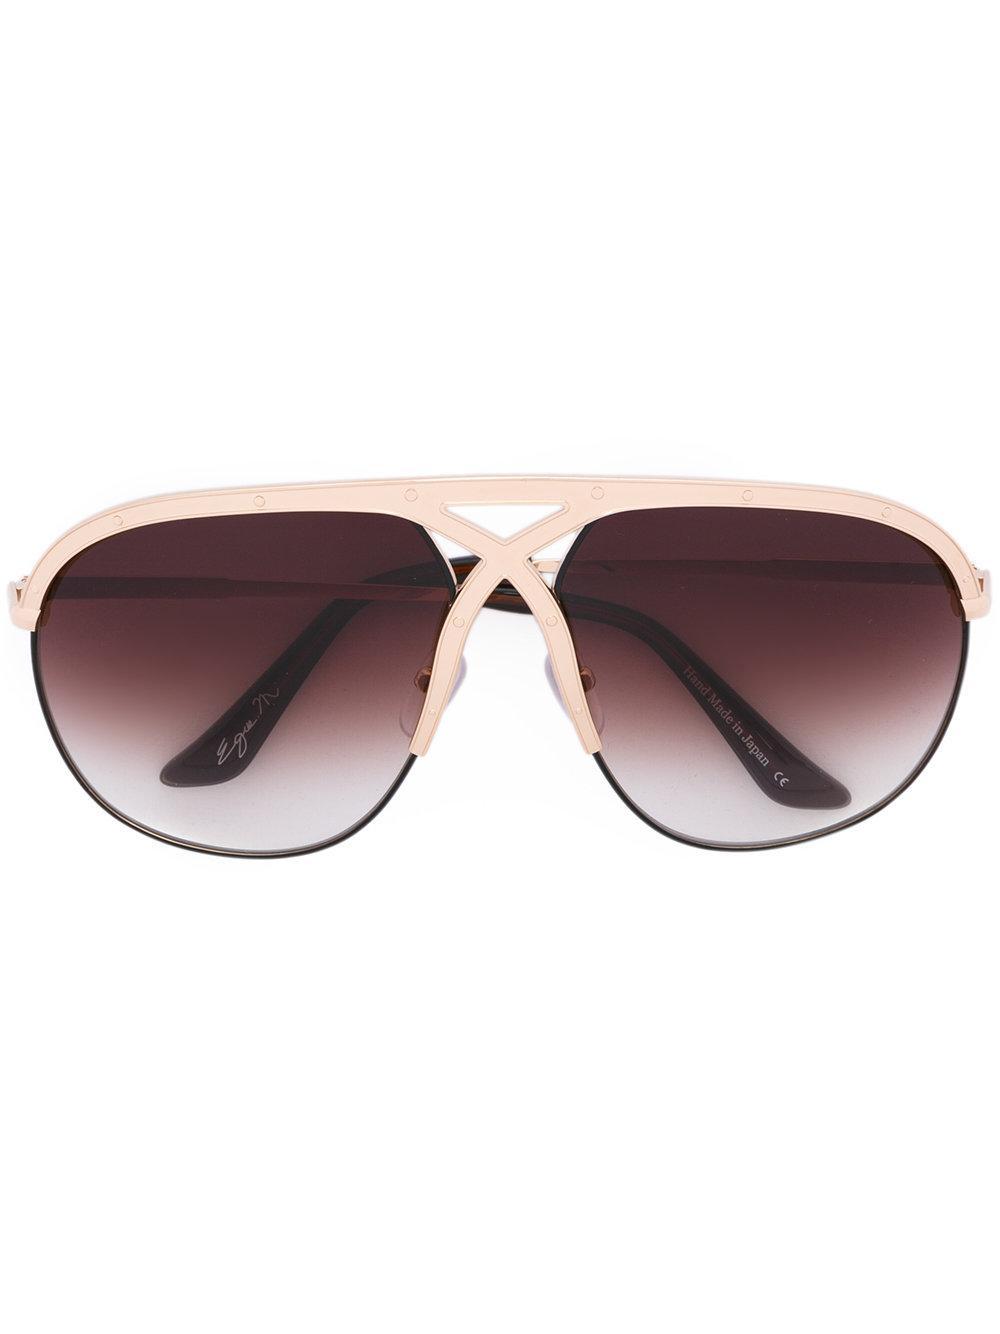 Frency & Mercury Voracious Sunglasses In Metallic